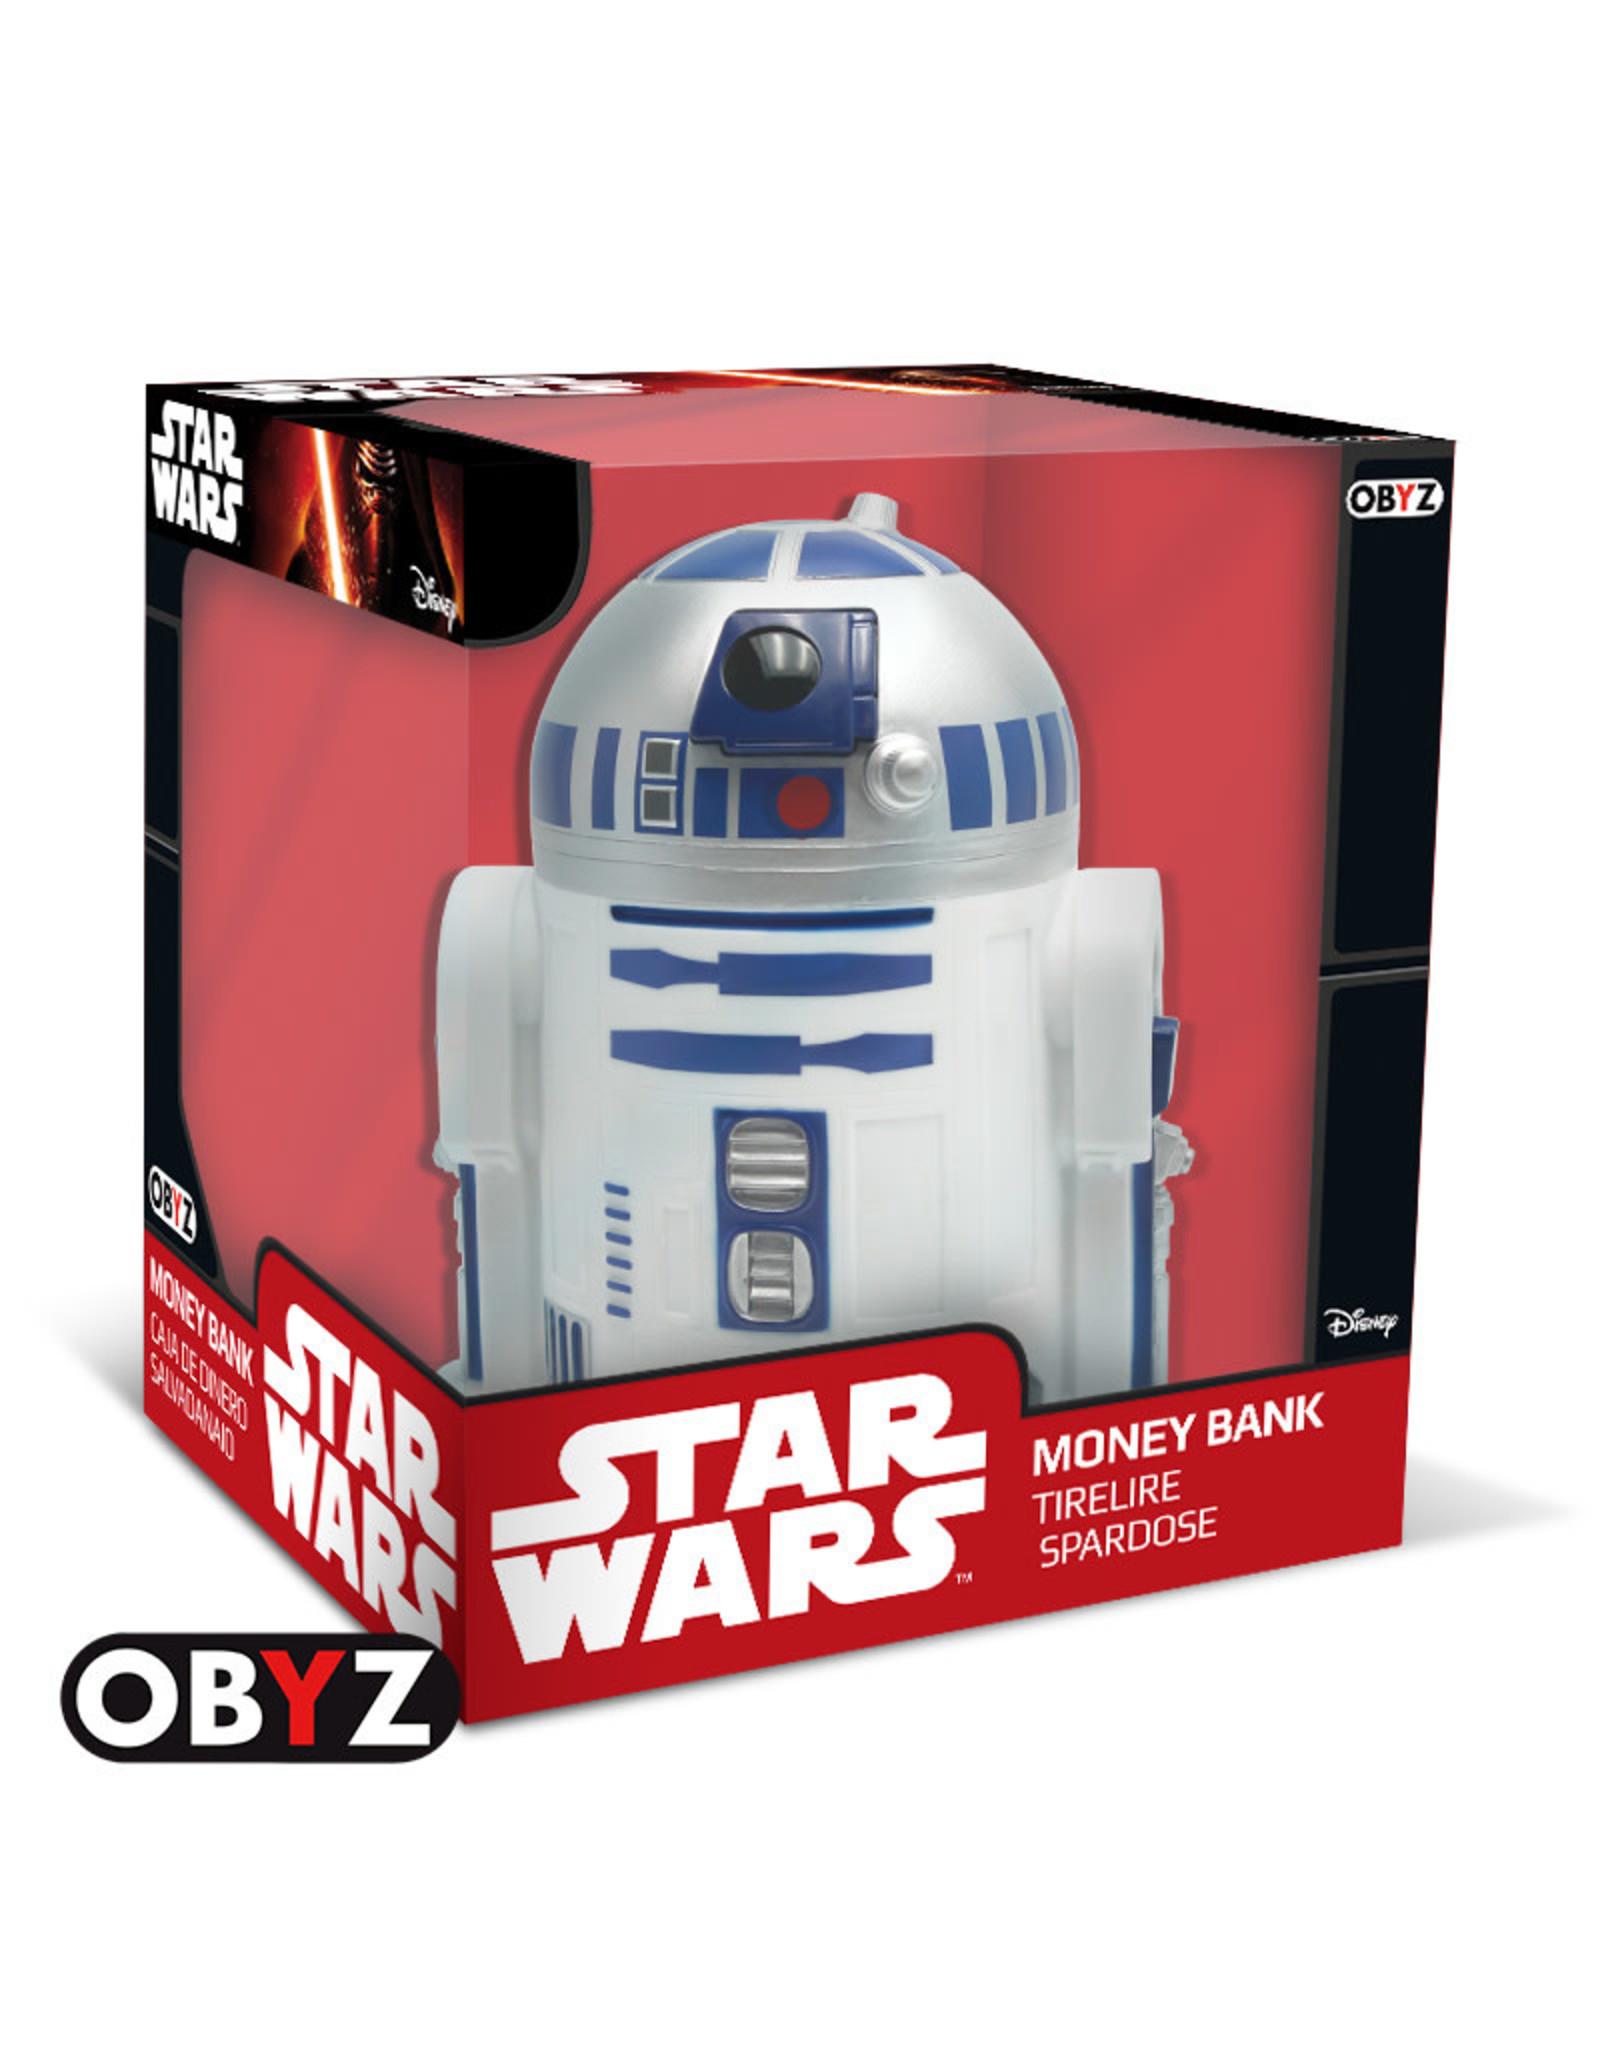 STAR WARS - Bust Bank - R2-D2